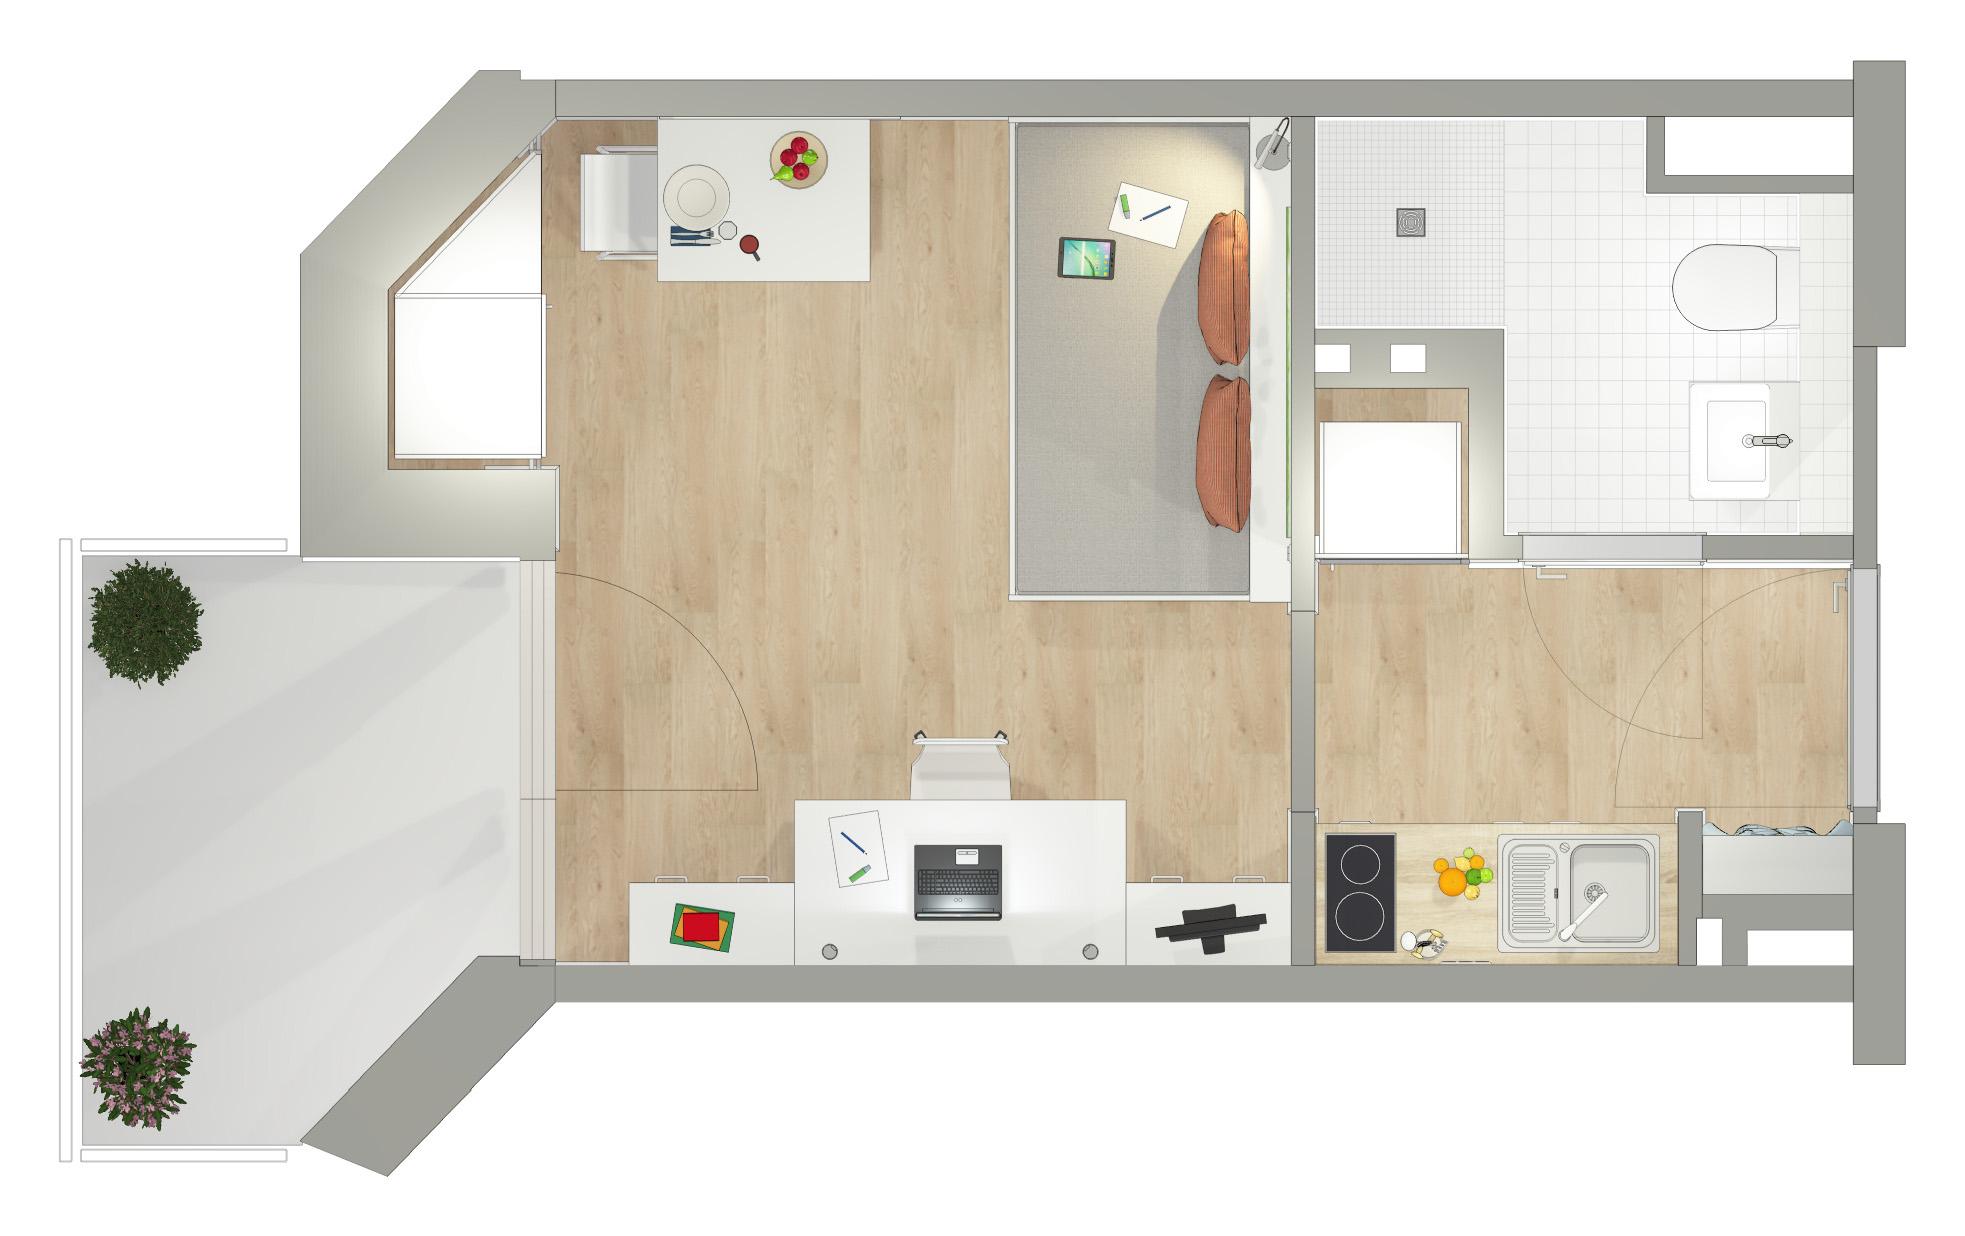 s dwink studenten apartments s dwink. Black Bedroom Furniture Sets. Home Design Ideas